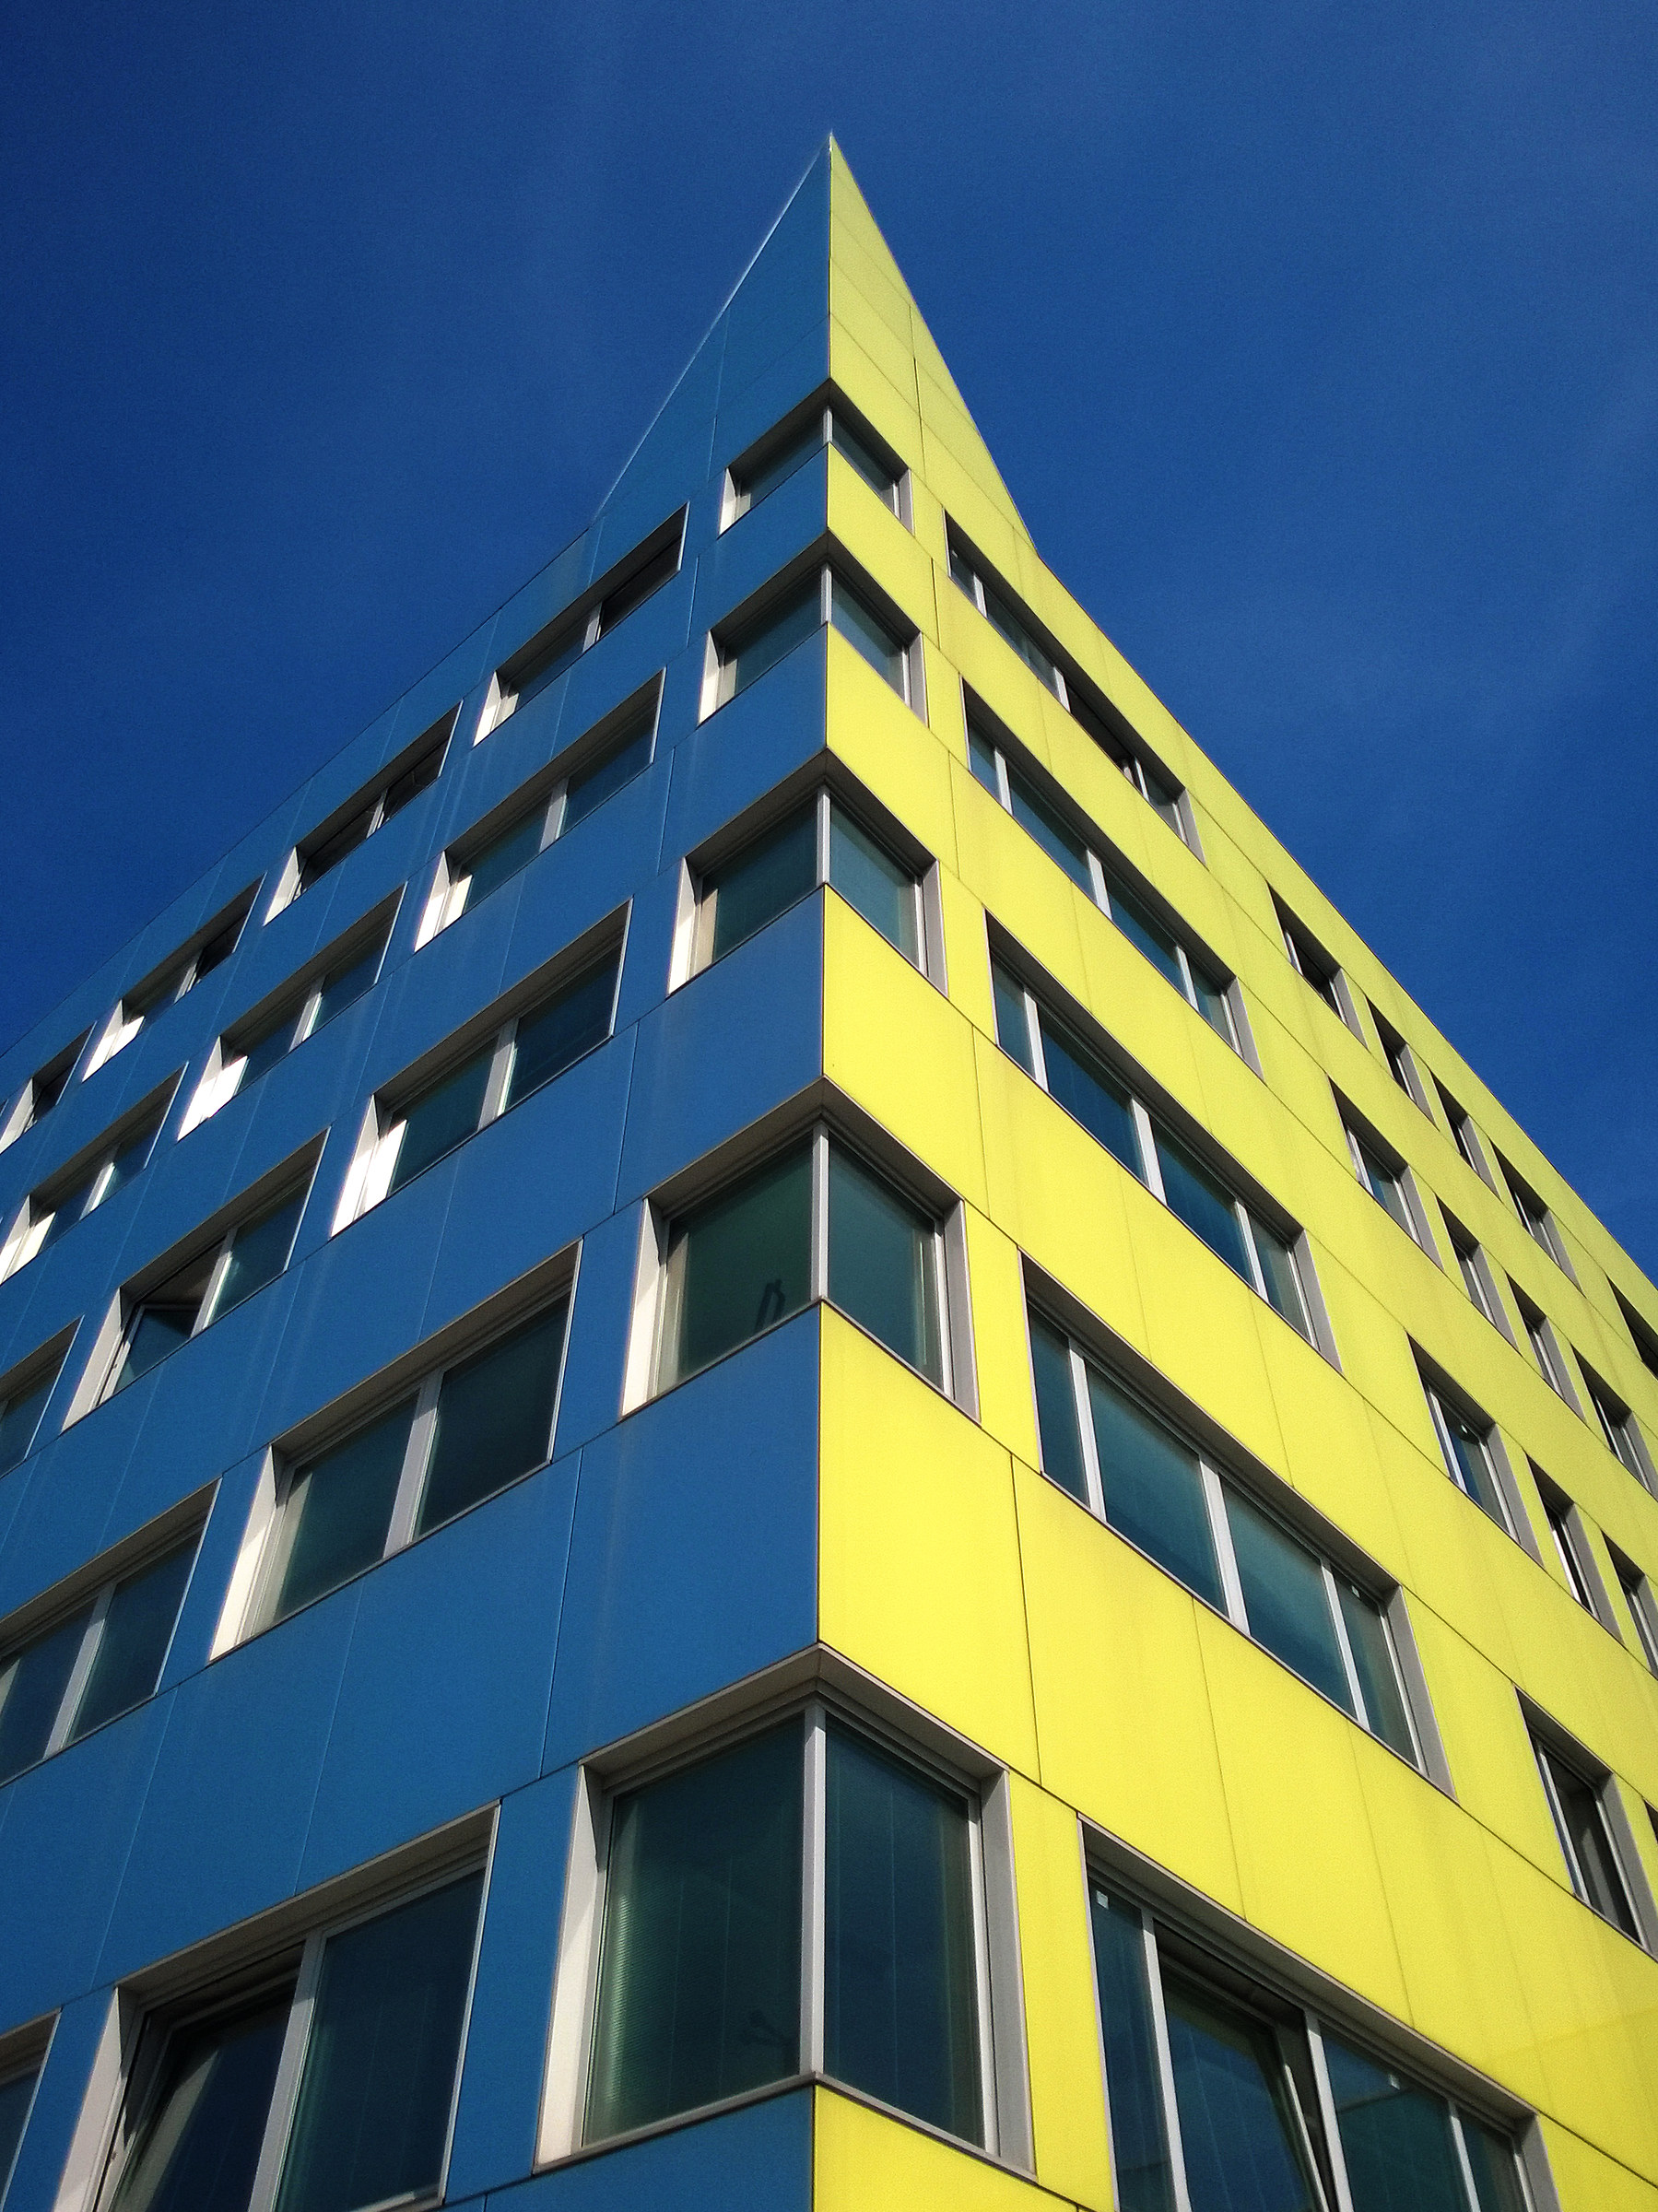 Milan from below - Color...